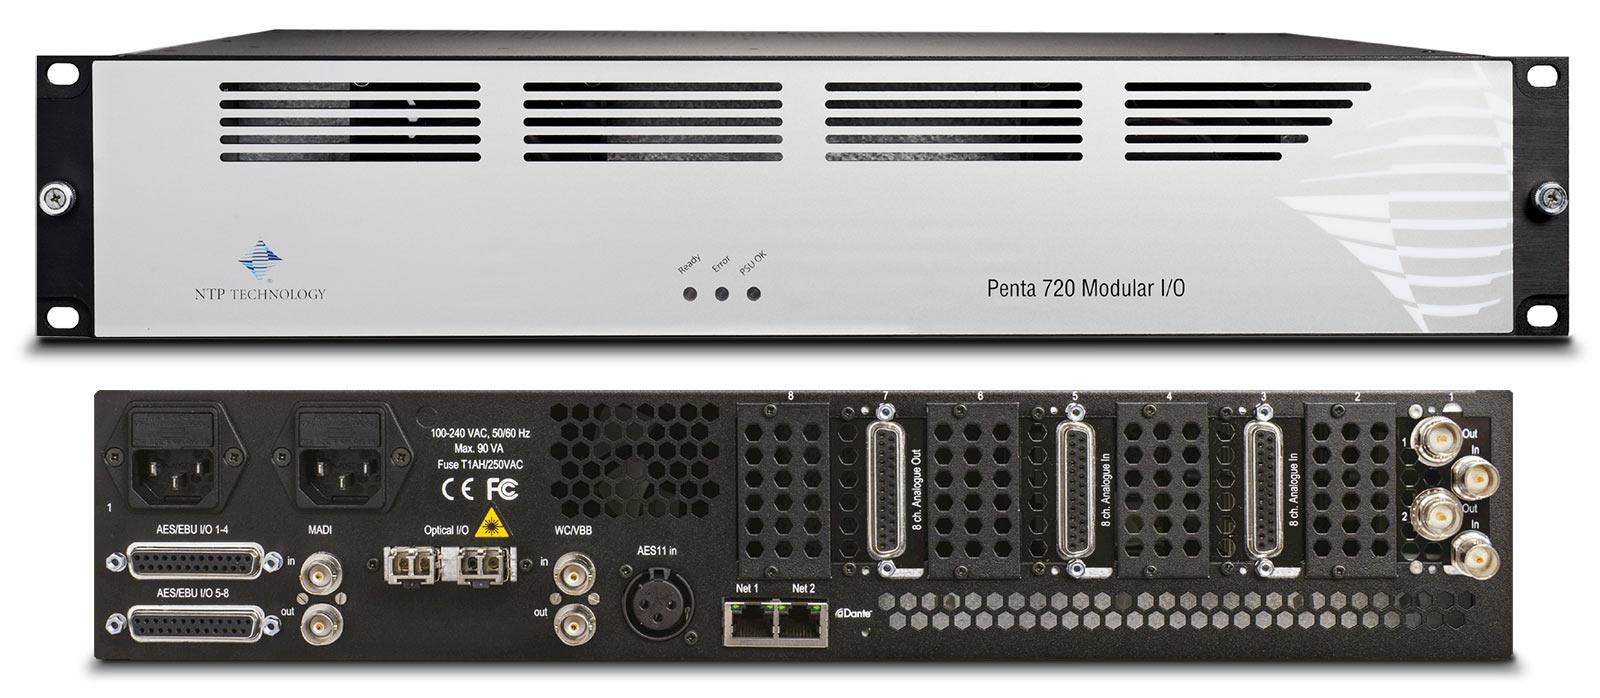 Penta 720 Modular I/O